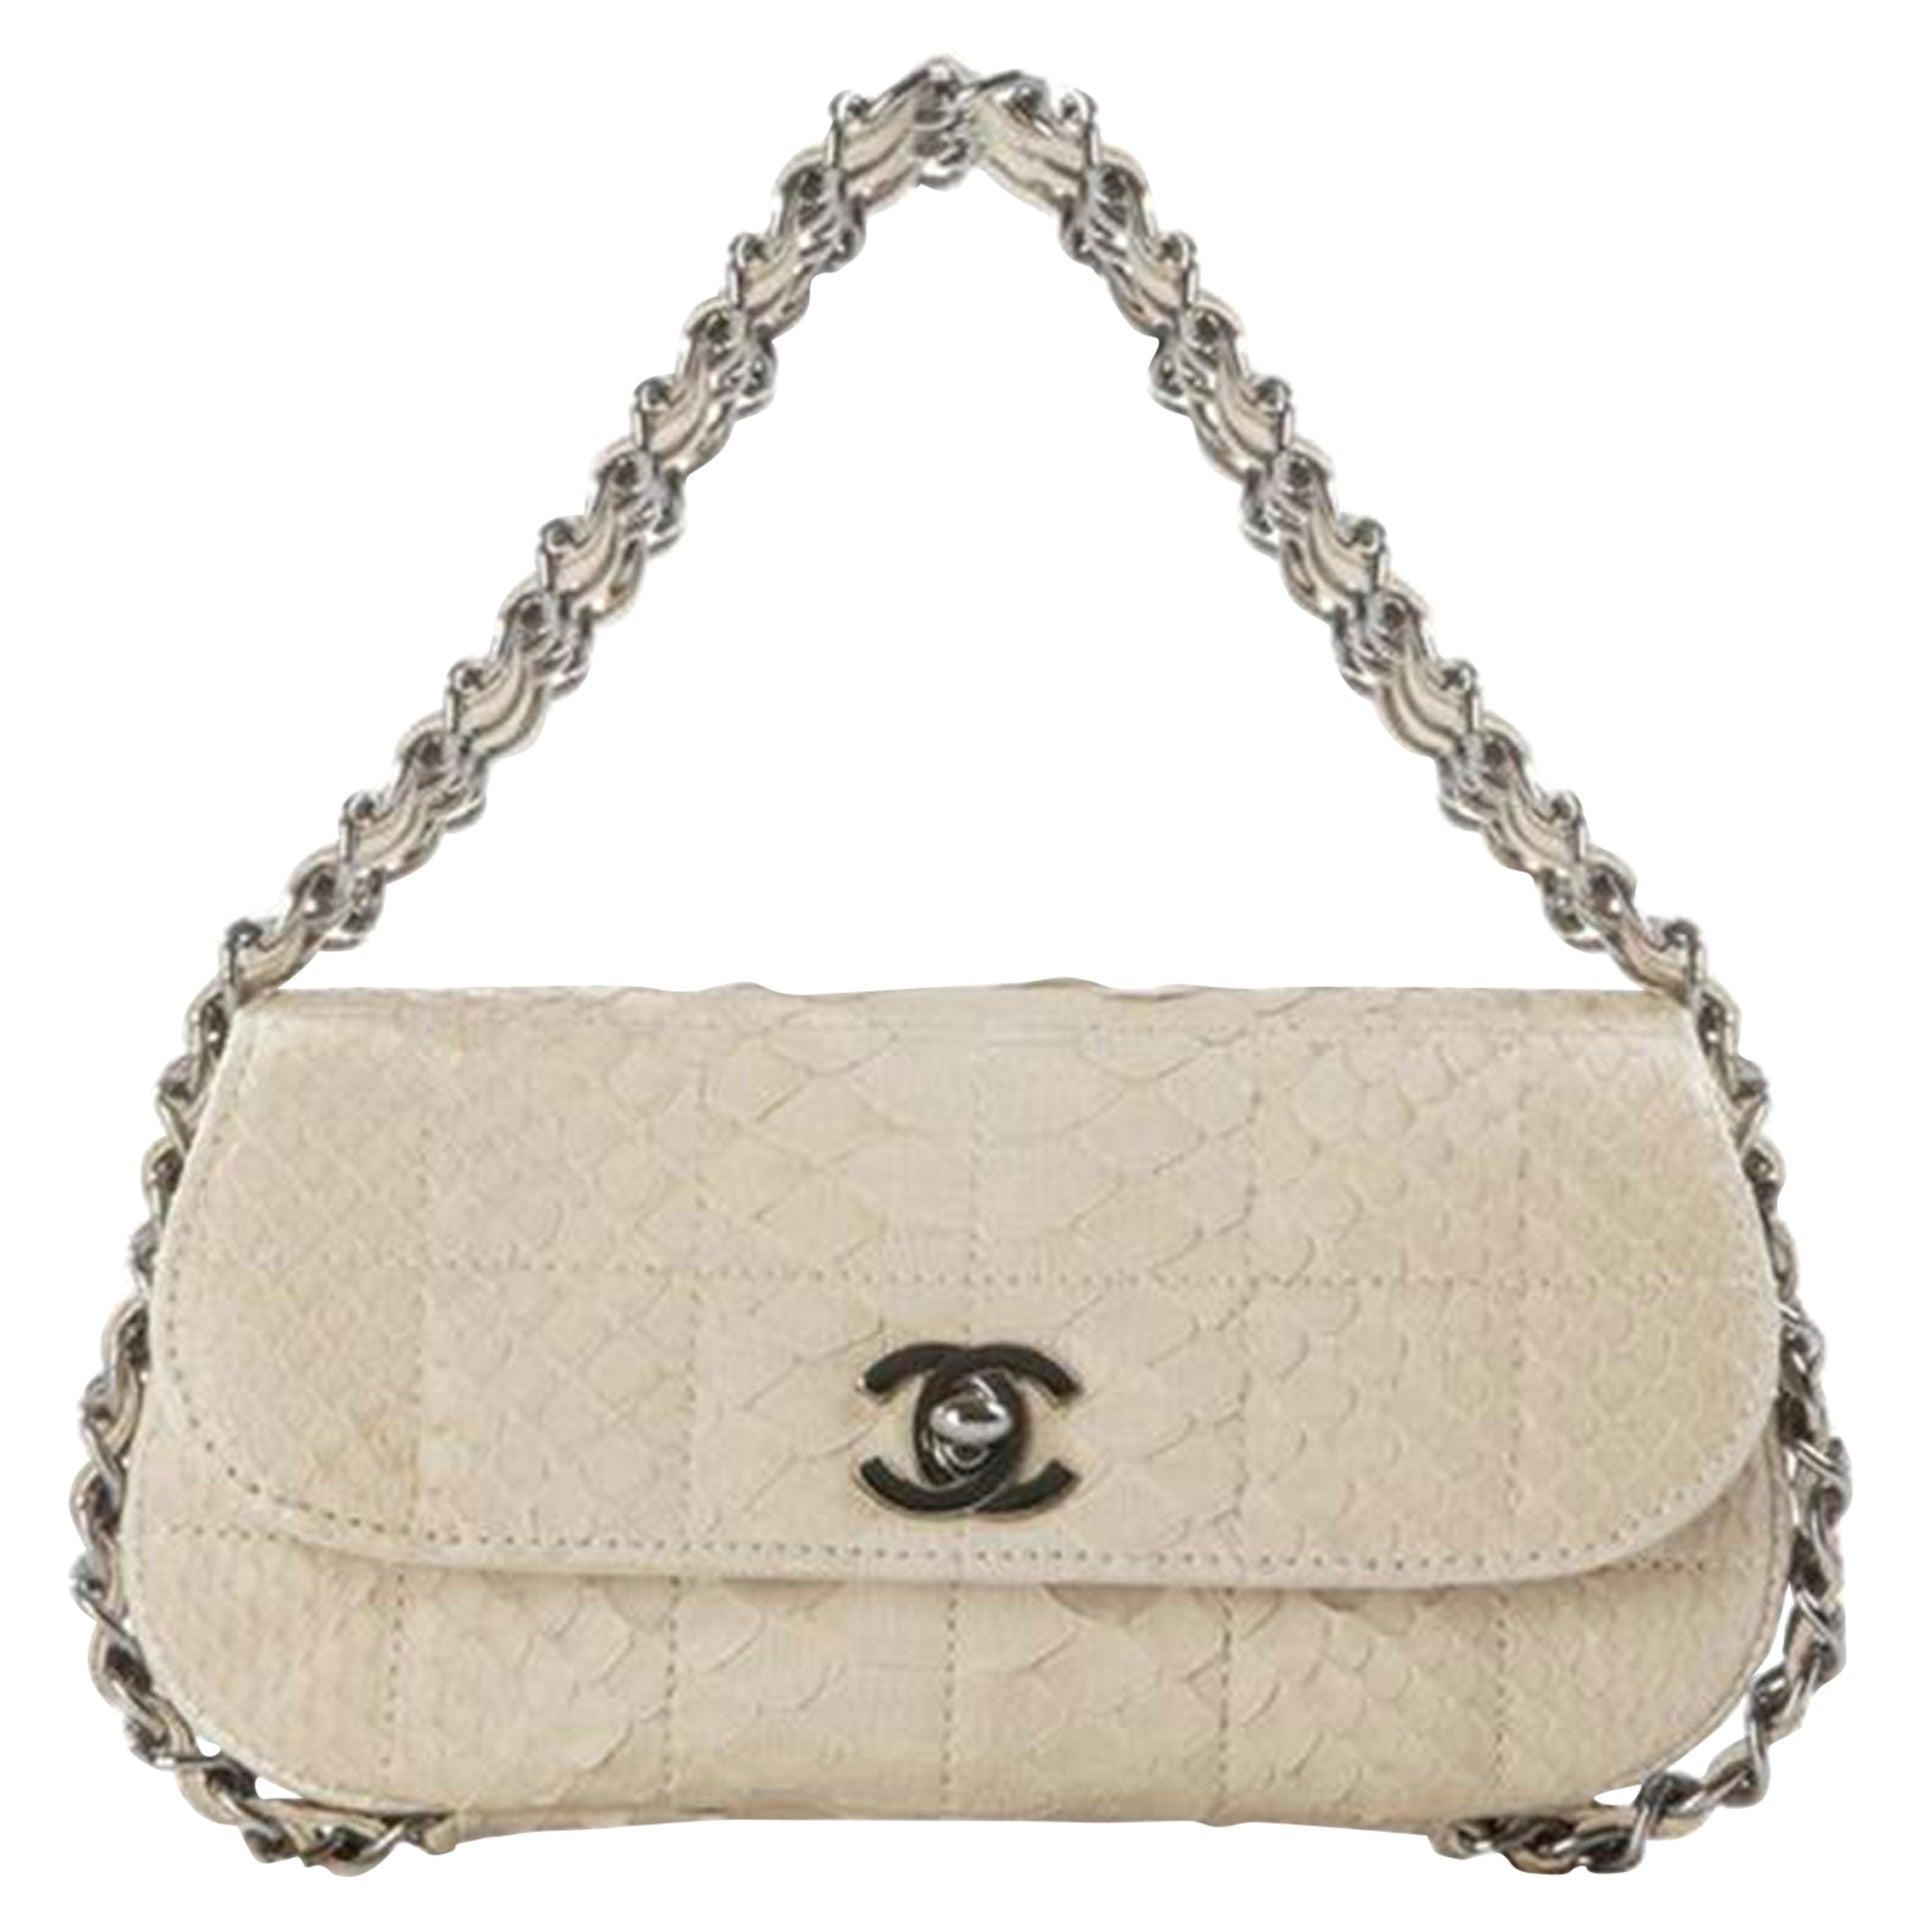 Chanel Beige Mini Flap Cream Python Mini Clutch Top Handle Flap Bag Minaudière